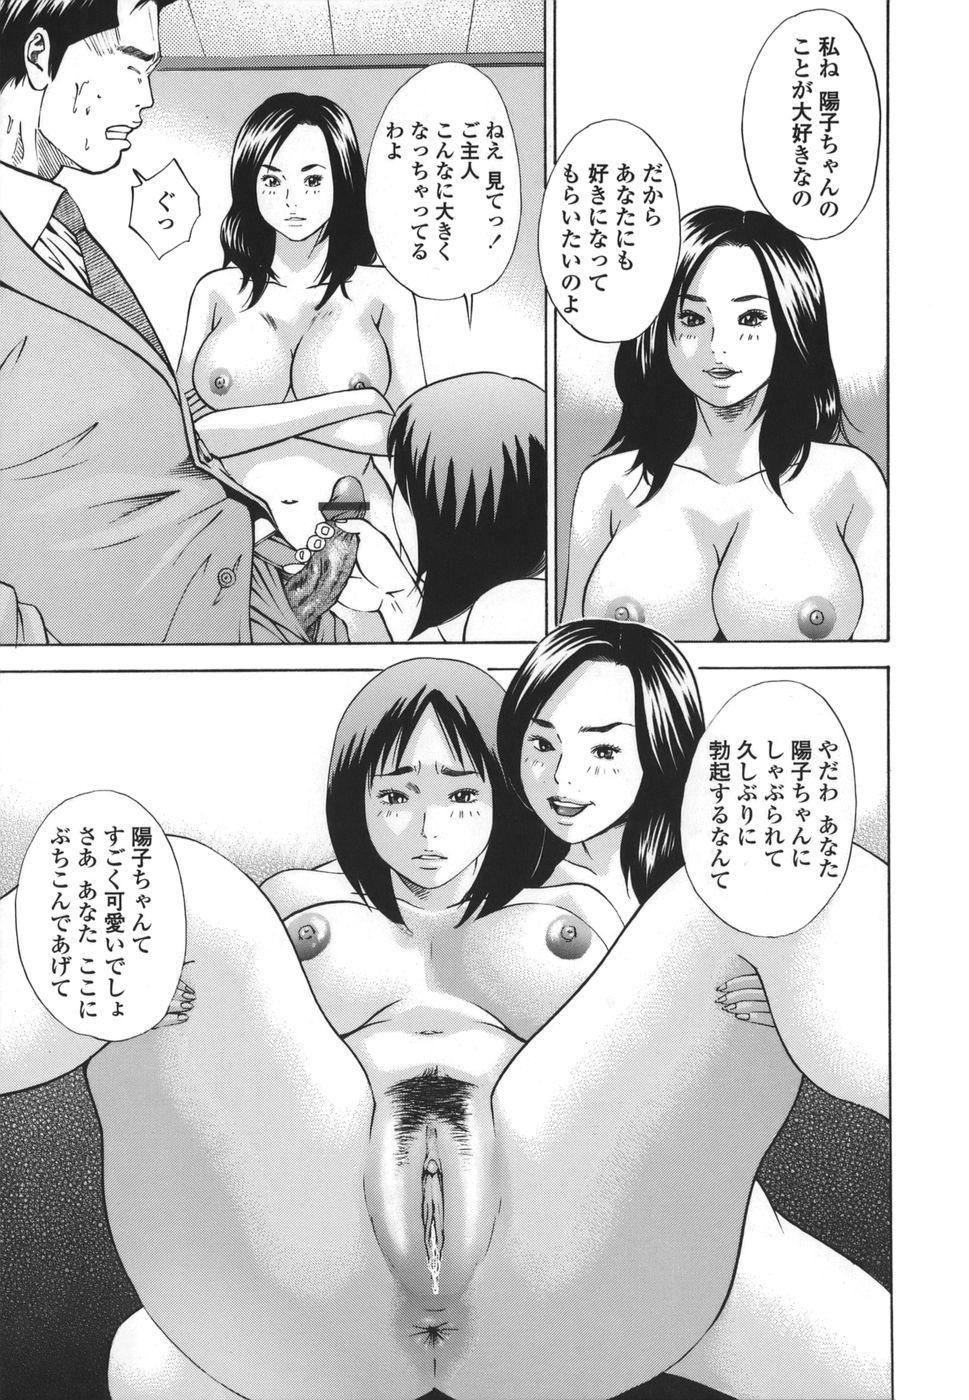 Kinshin Goukan - Near Relation Rapes 118